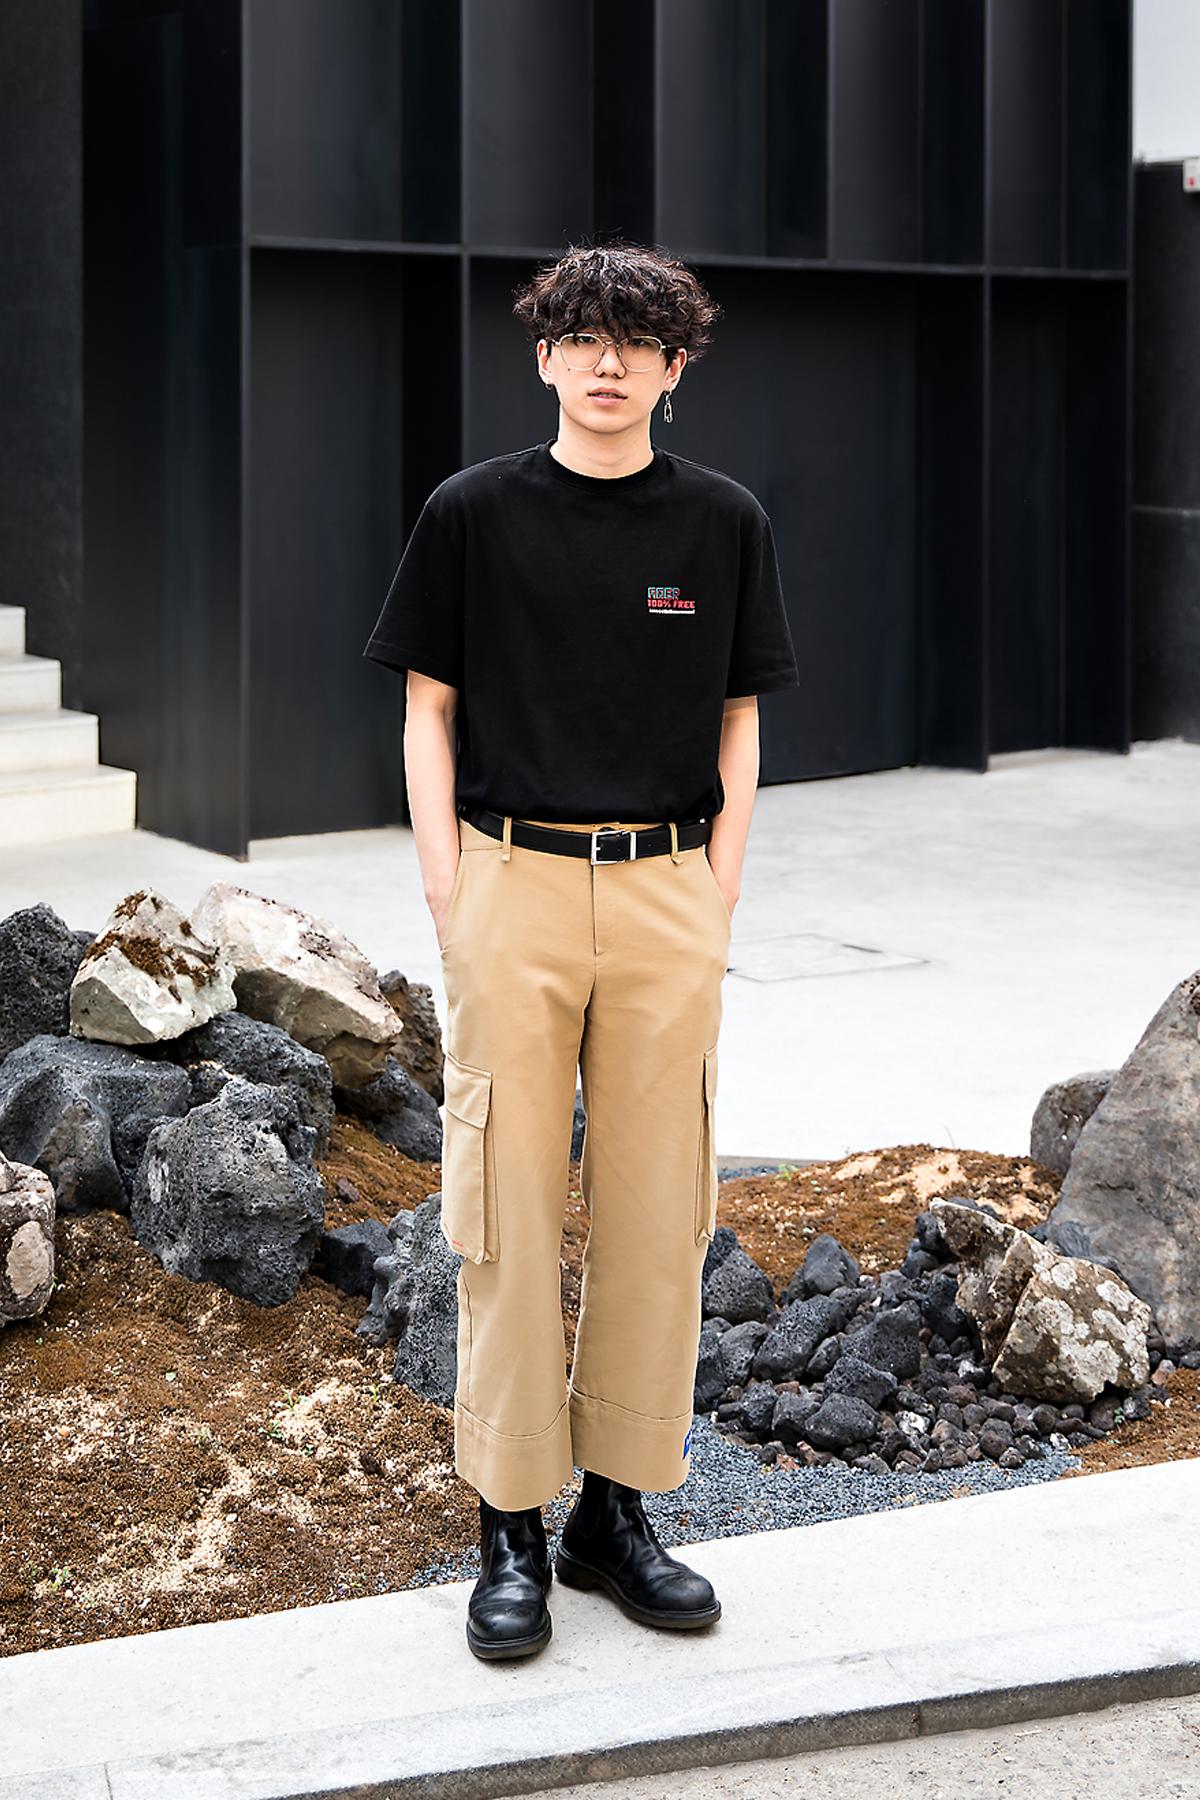 Yoo Hanrim, Street Fashion 2017 in Seoul